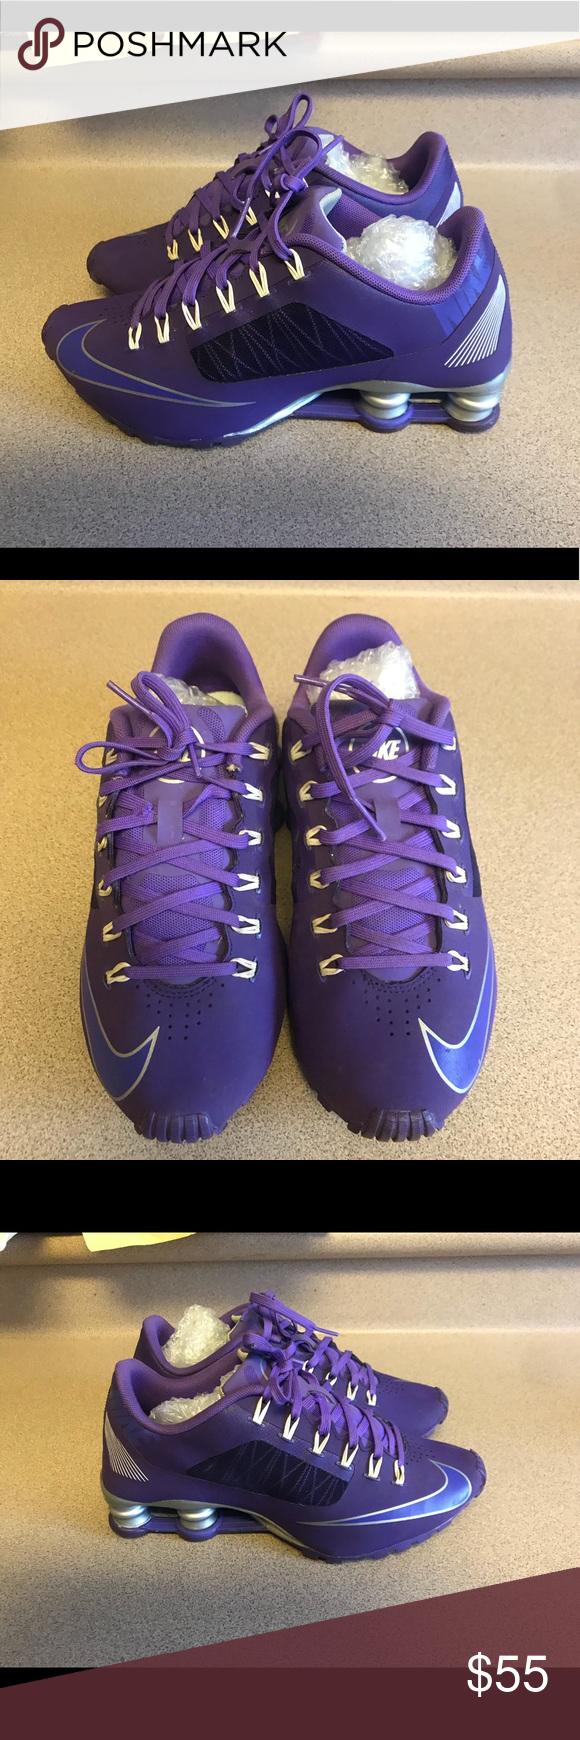 87deac69492c6e PreOwned Nike Women s 7 Shox Superfly R4 Purple PreOwned Nike Women s 7 Shox  Superfly R4 Purple